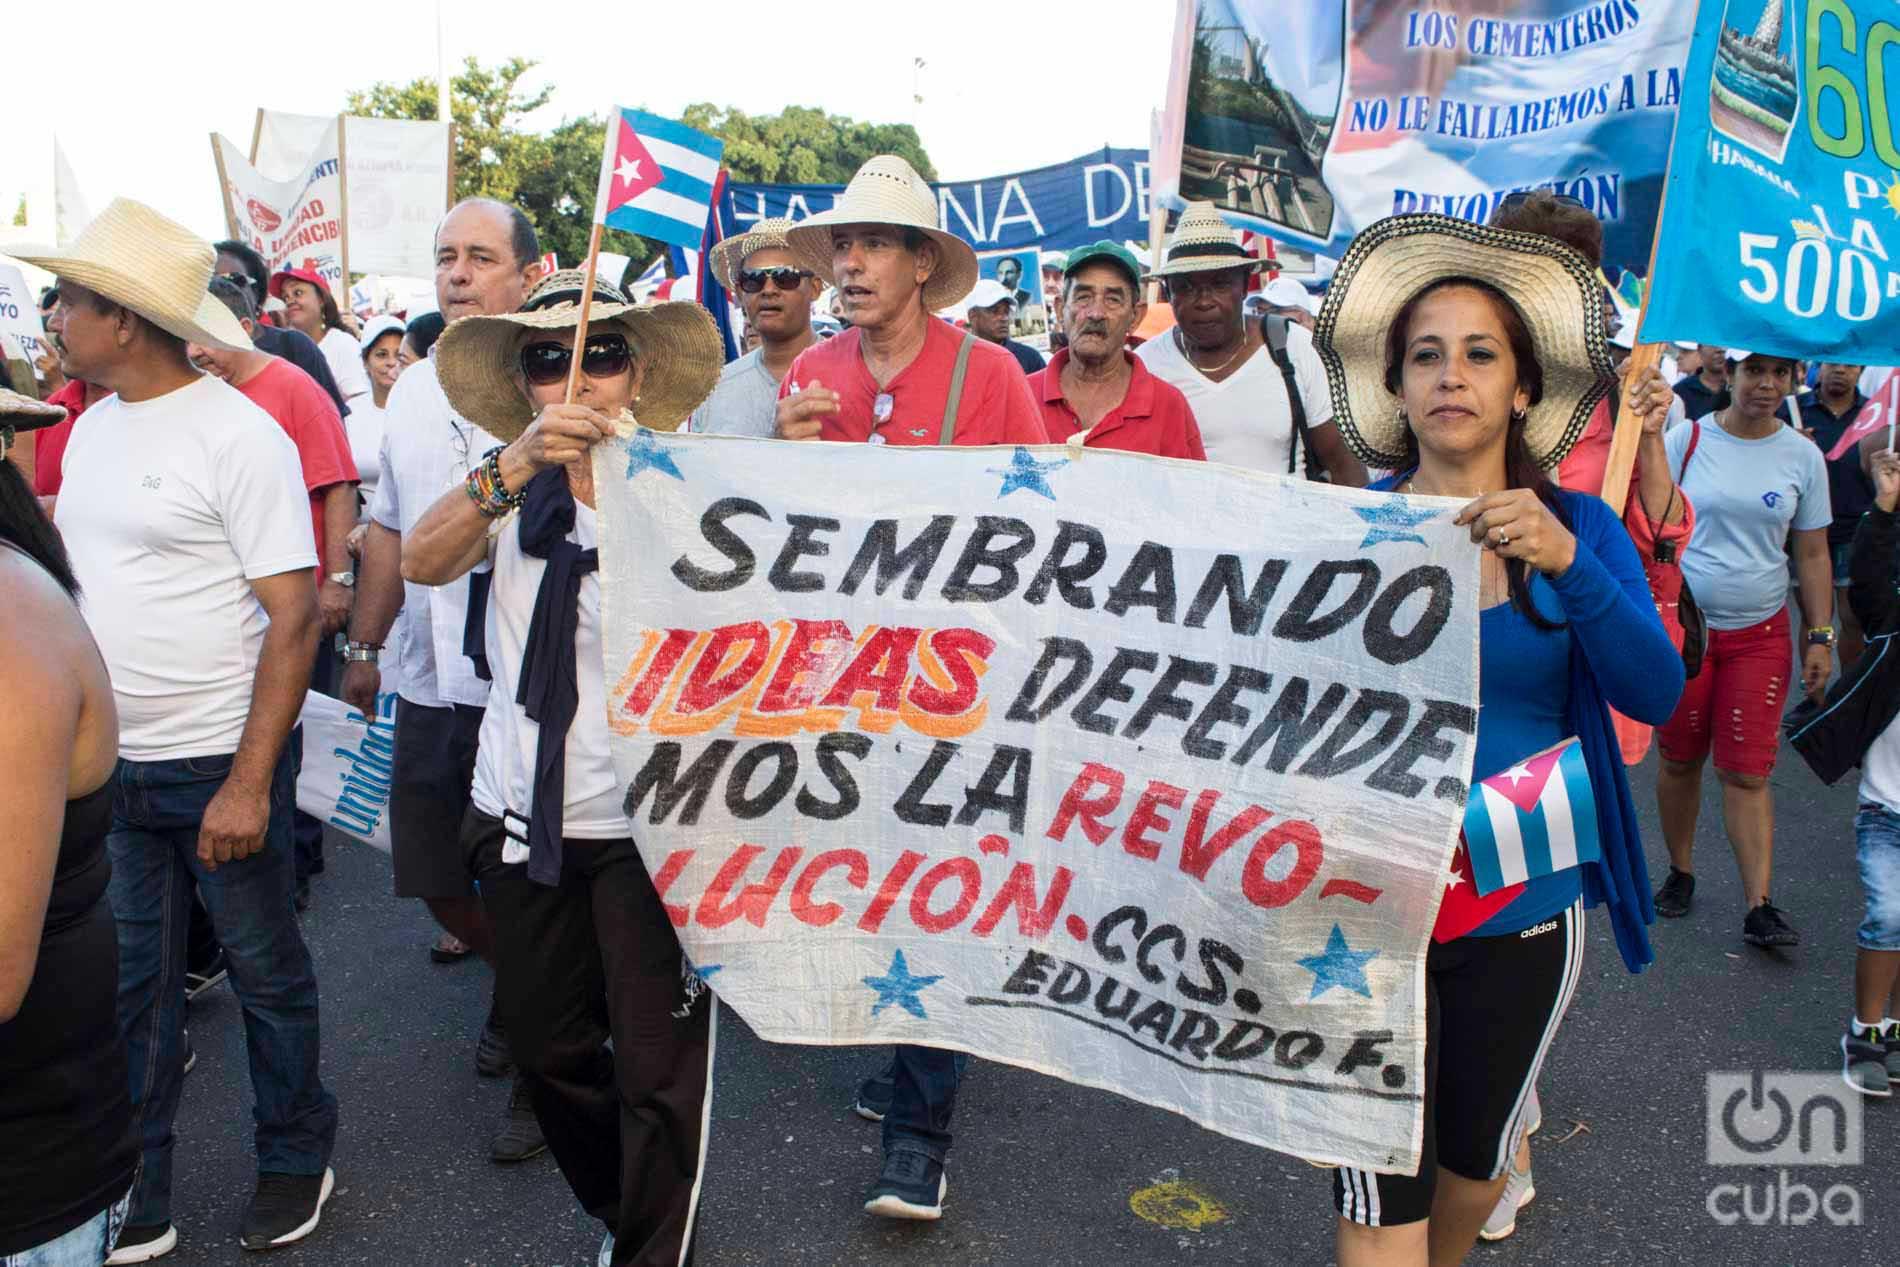 International Workers Day parade, on May 1, 2019 in Havana's José Martí Revolution Square. Photo: Otmaro Rodríguez.